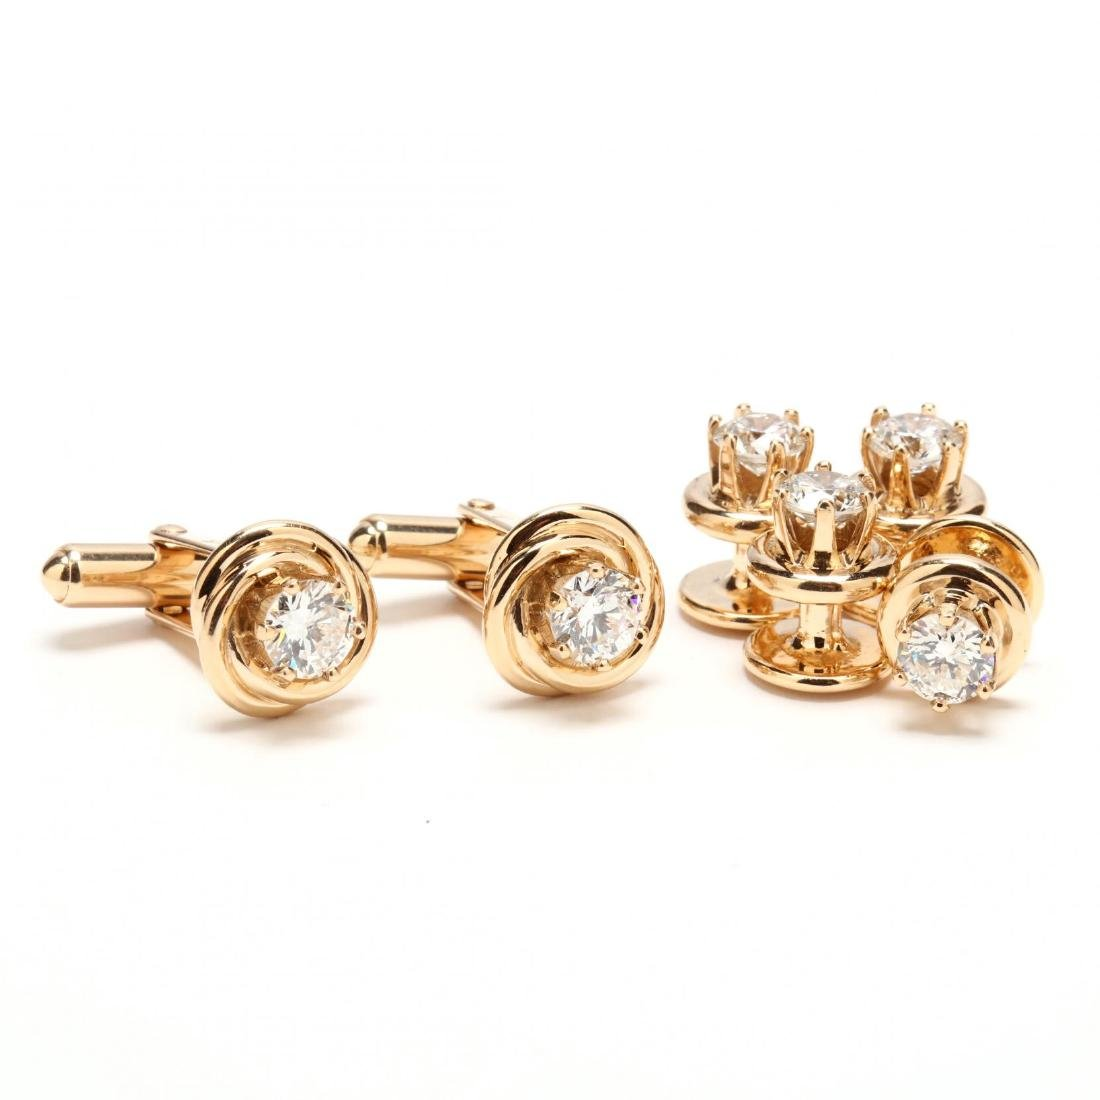 14KT Gold and Diamond Dress Set